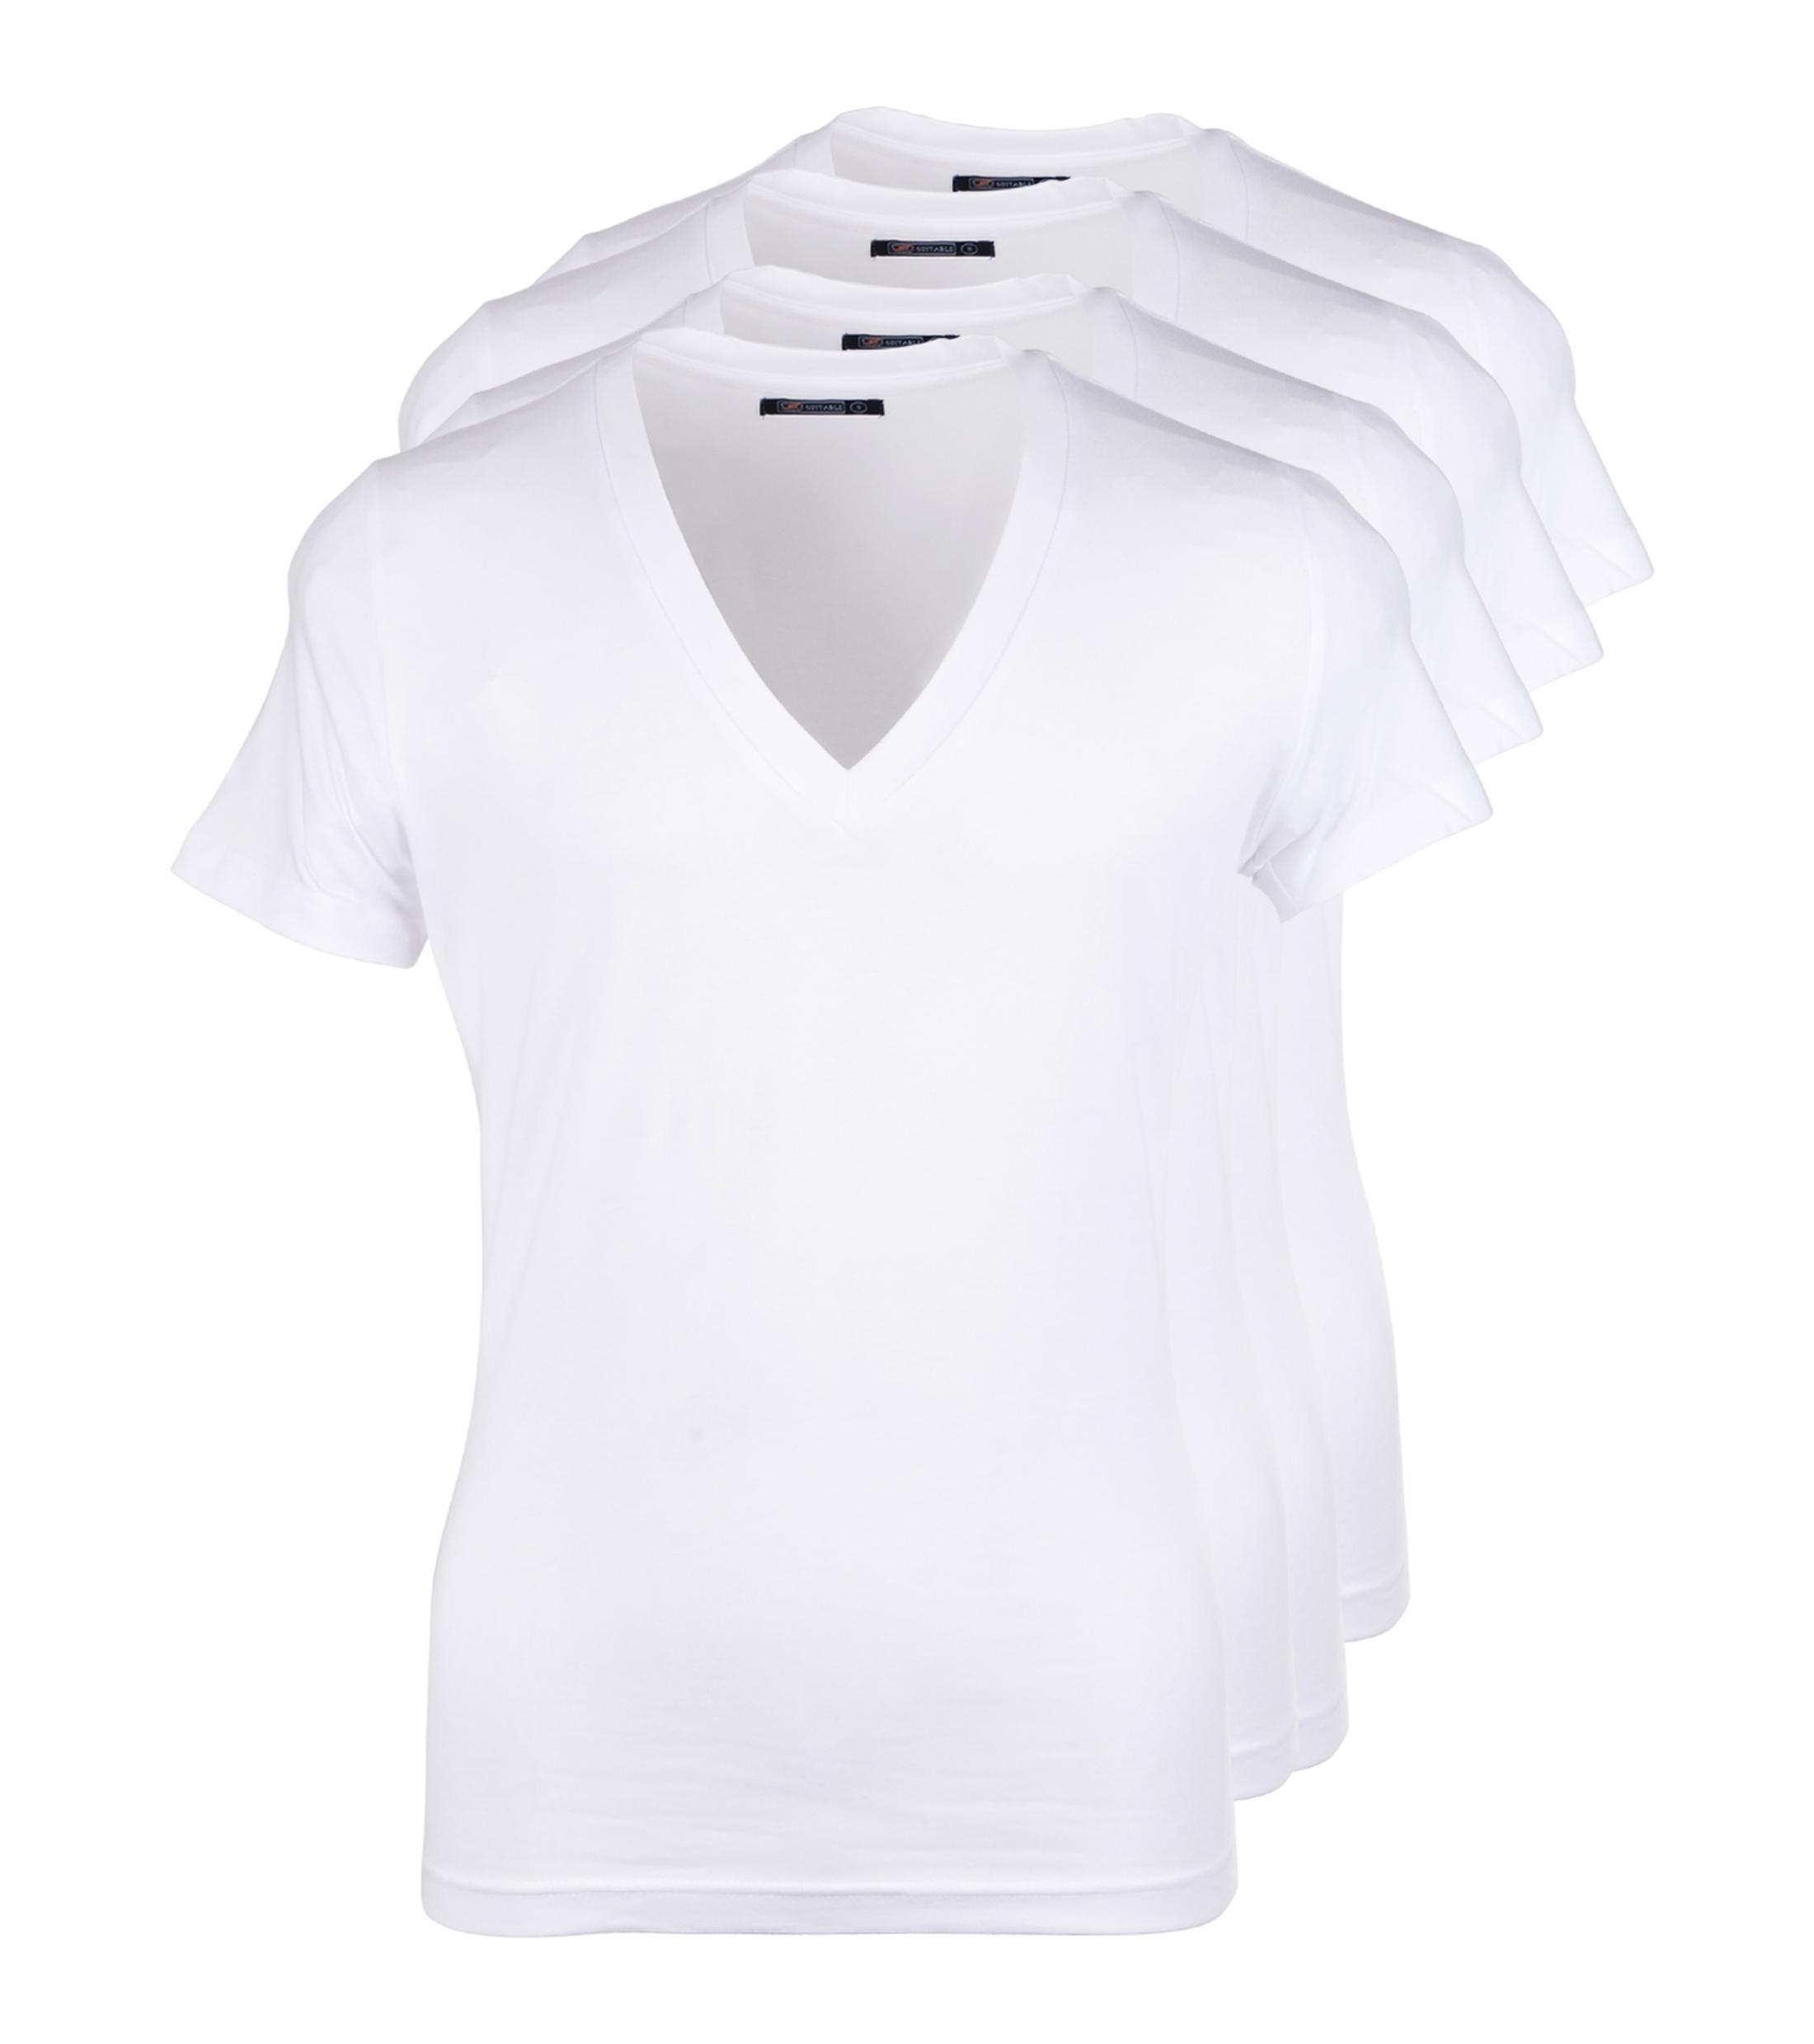 Diepe v hals 4 pack stretch t shirt for Designhotel maastricht comfort xl